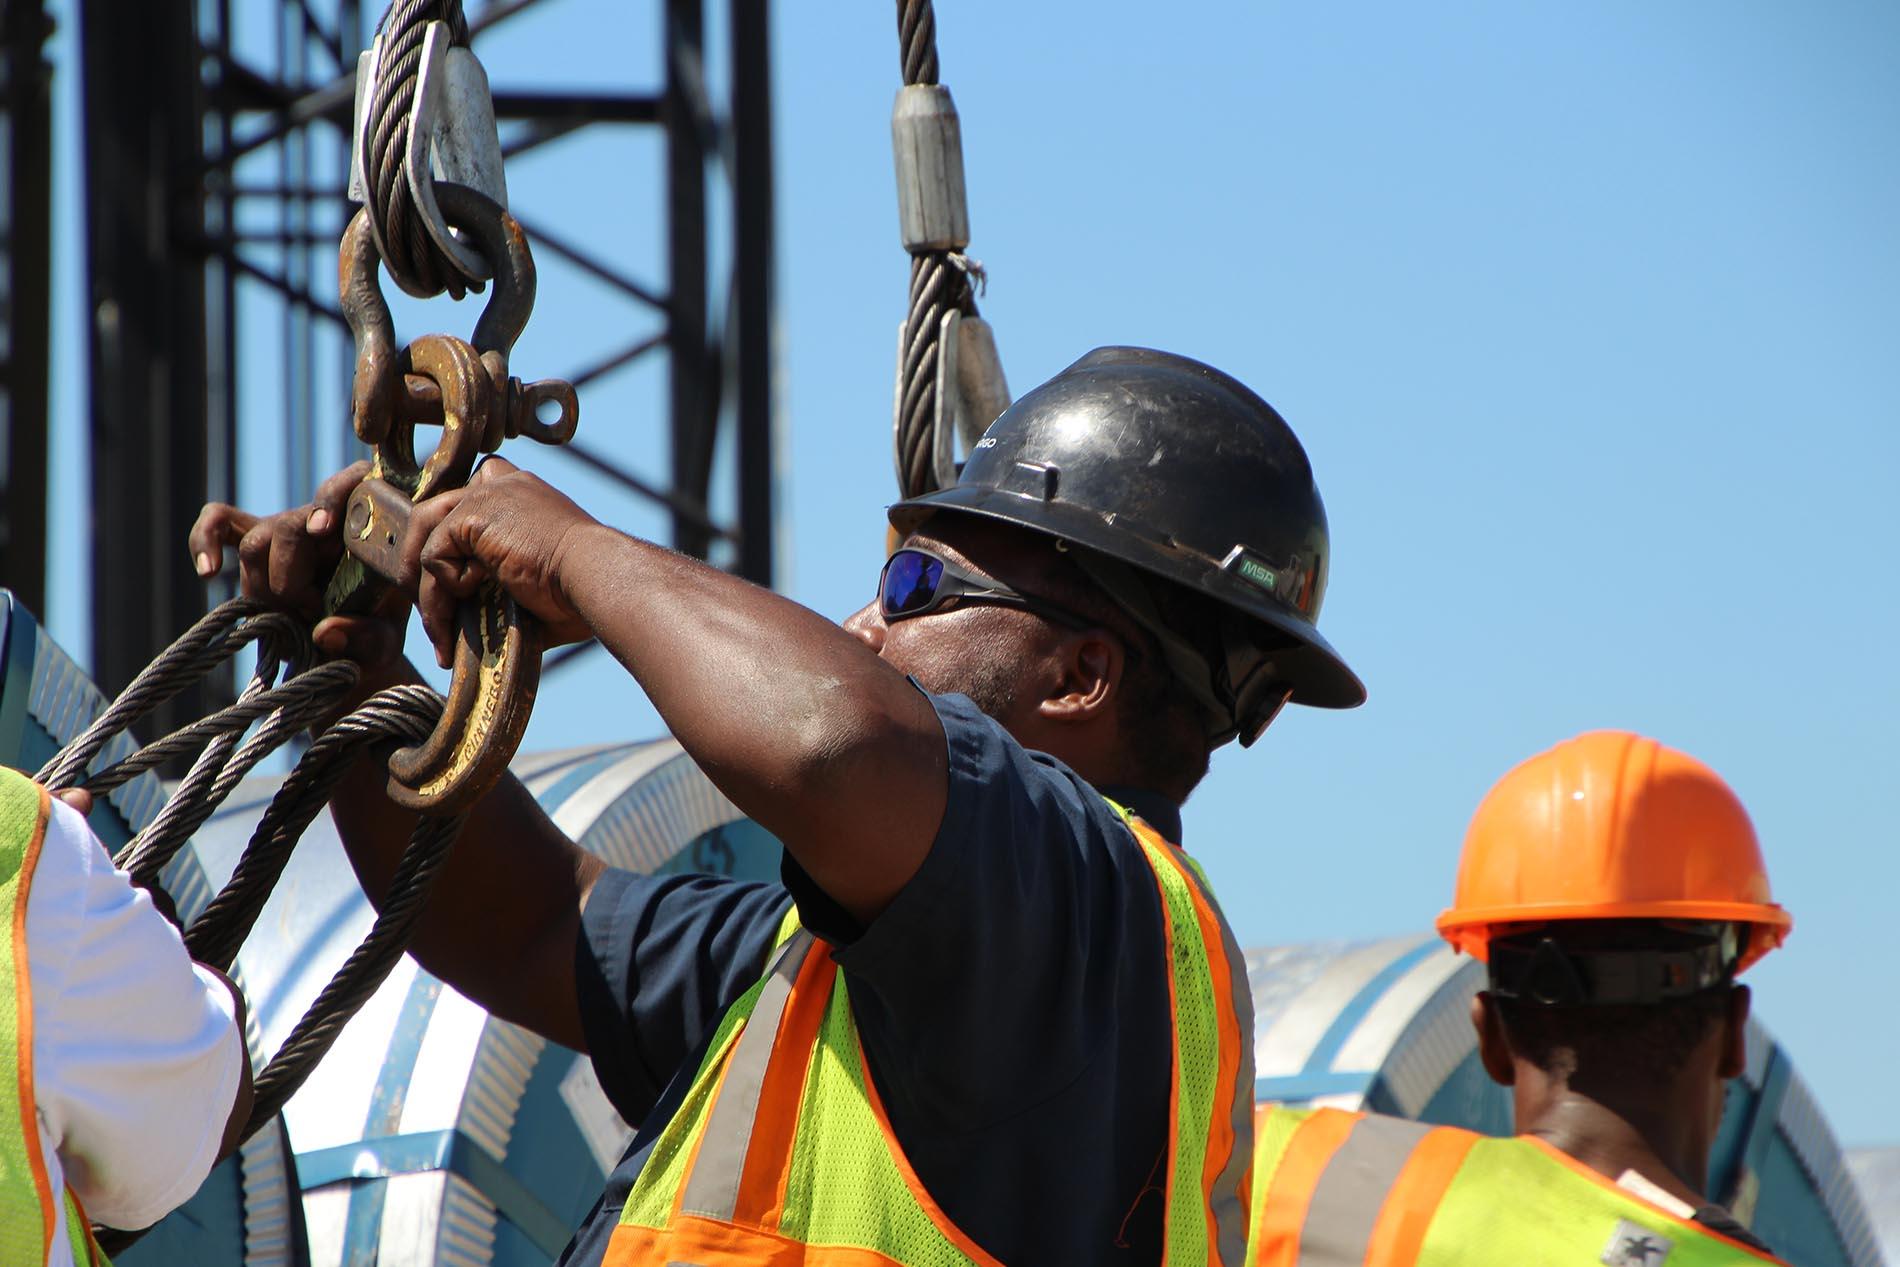 Men rigging